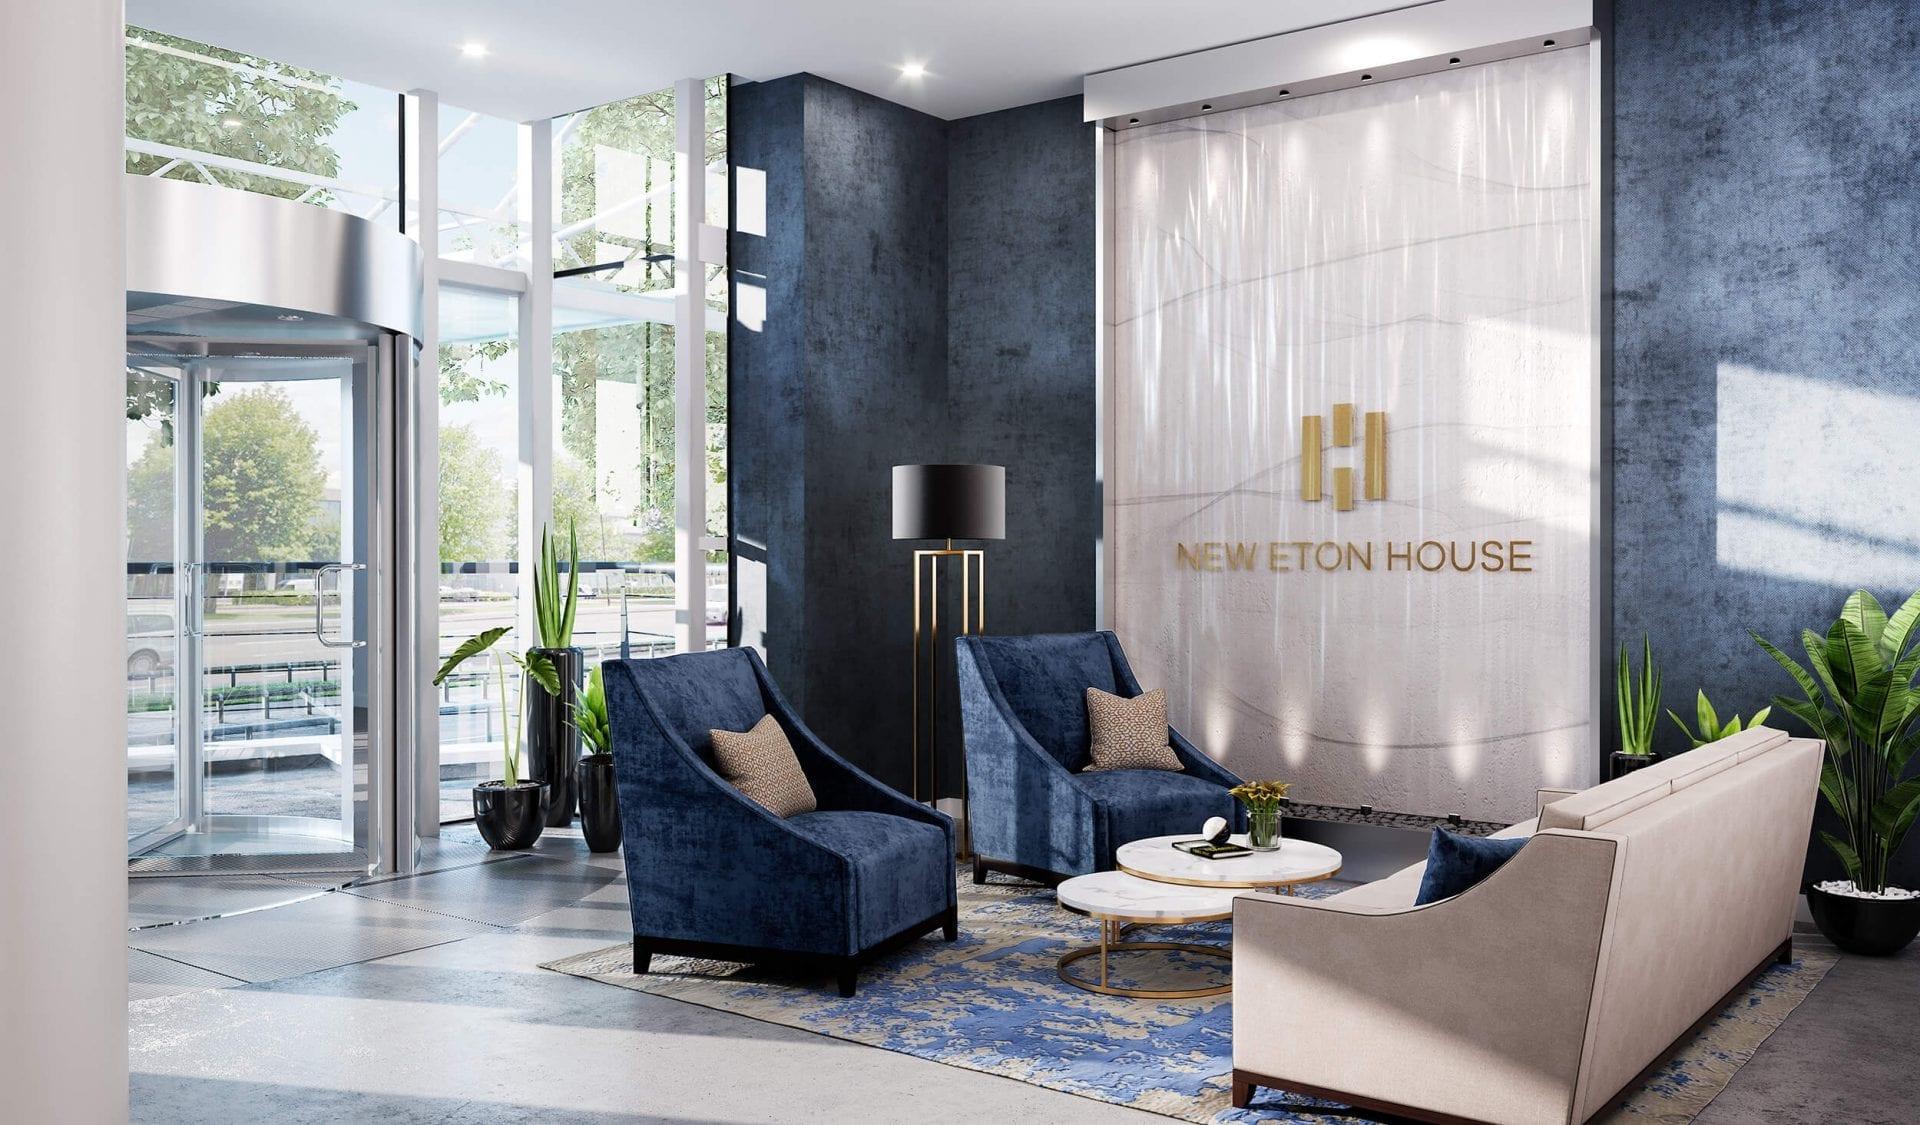 New Eton House Lobby